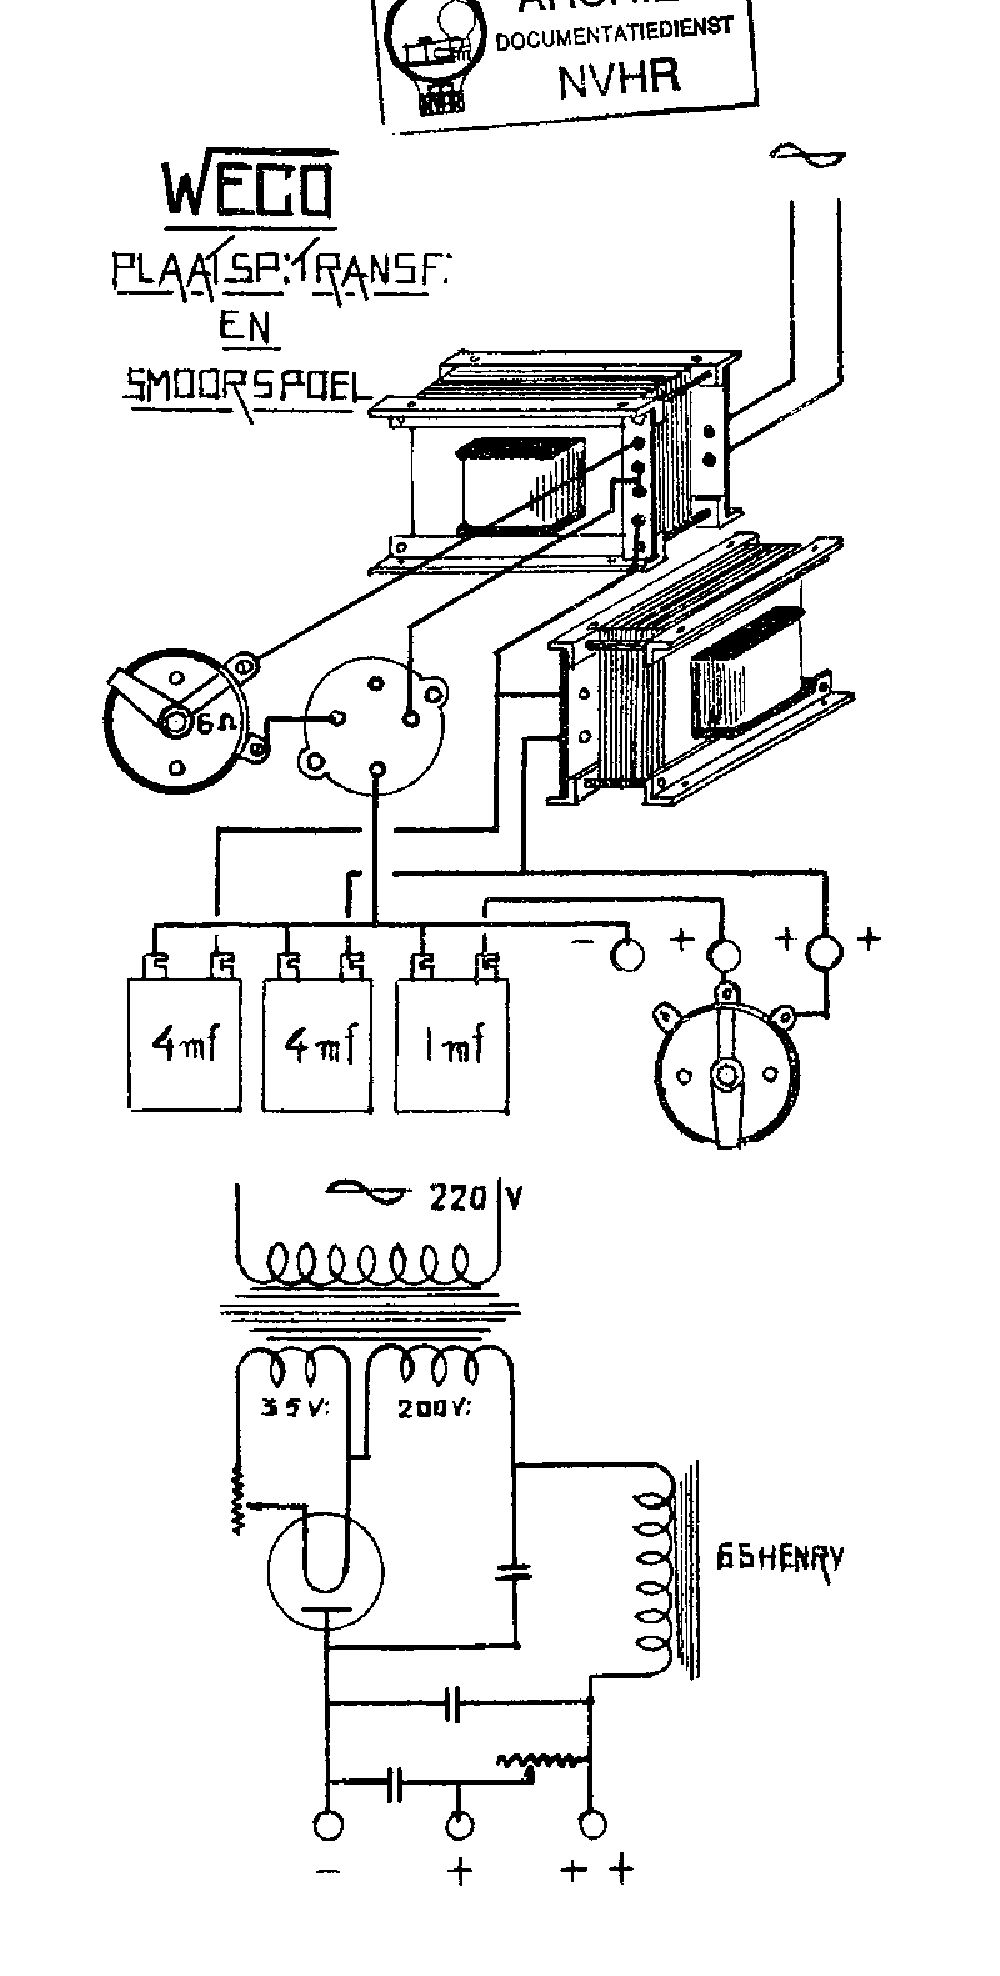 WECO PSA-B VINTAGE PLATTENSPIELER NETZTEIL SCH service manual (1st page)